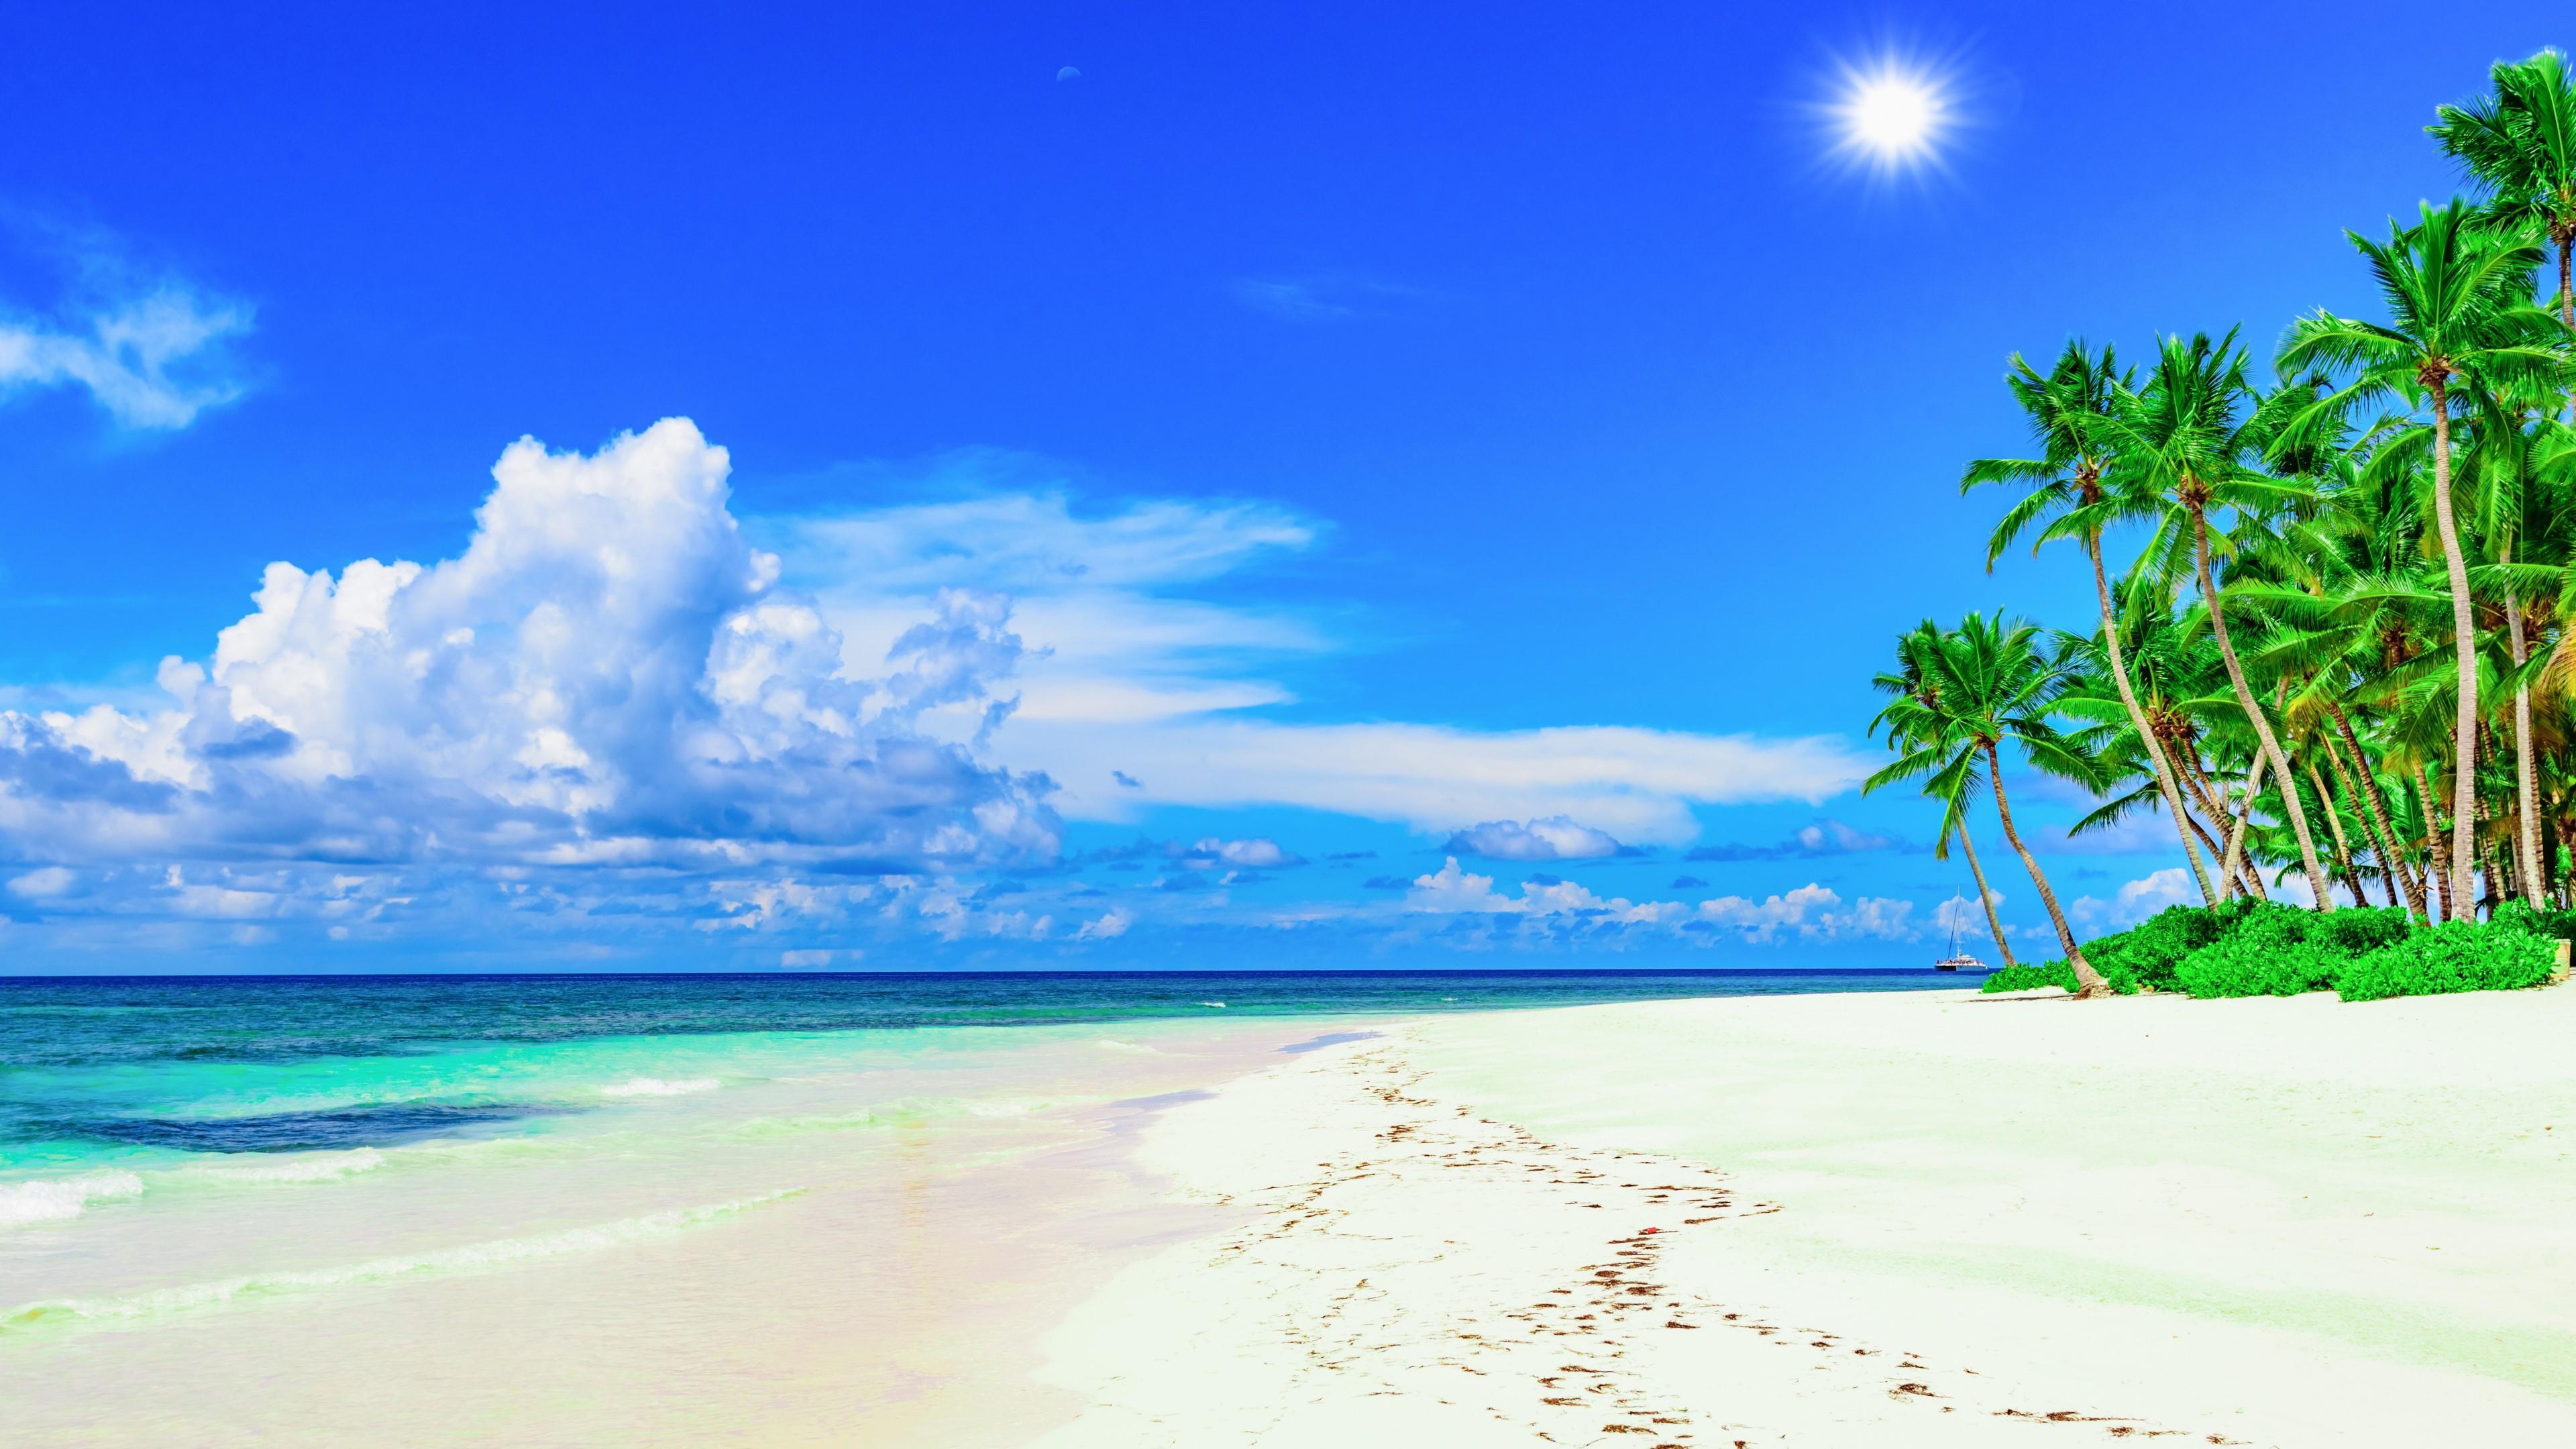 Sunny beach wallpaper - backiee